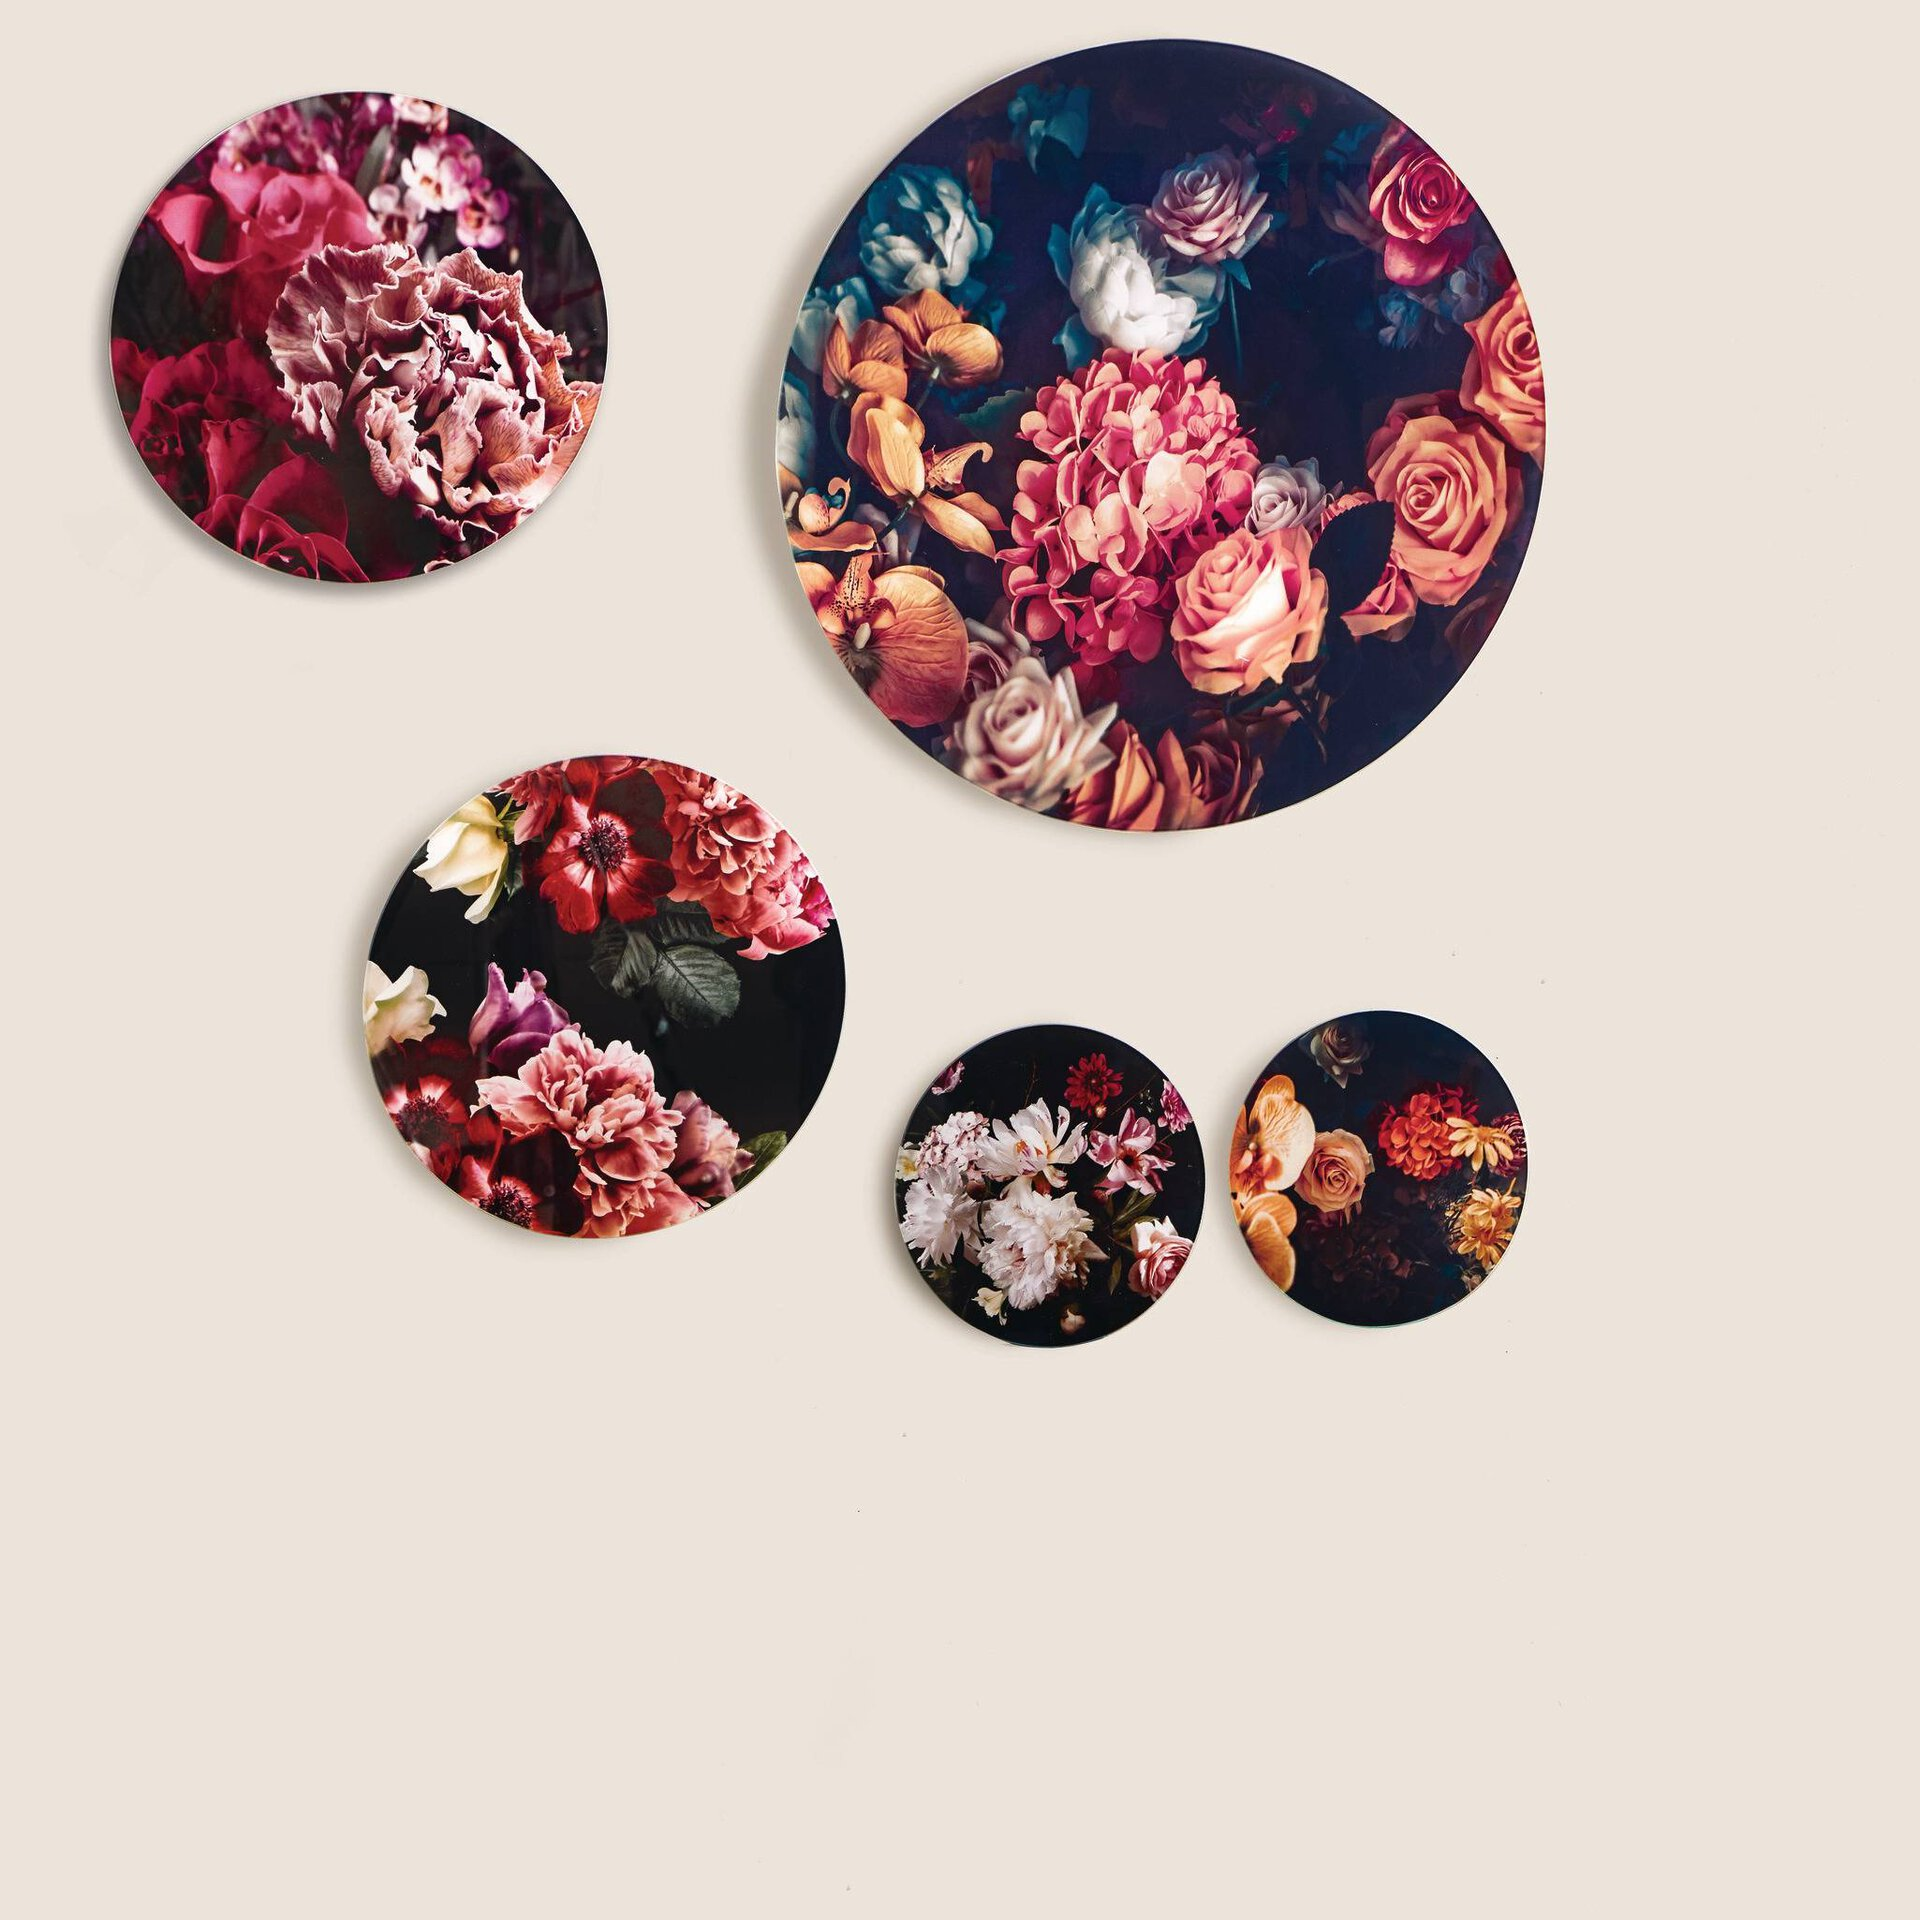 Bild Baroque Flowers VI Pro-Art Glas mehrfarbig 30 x 30 x 1 cm